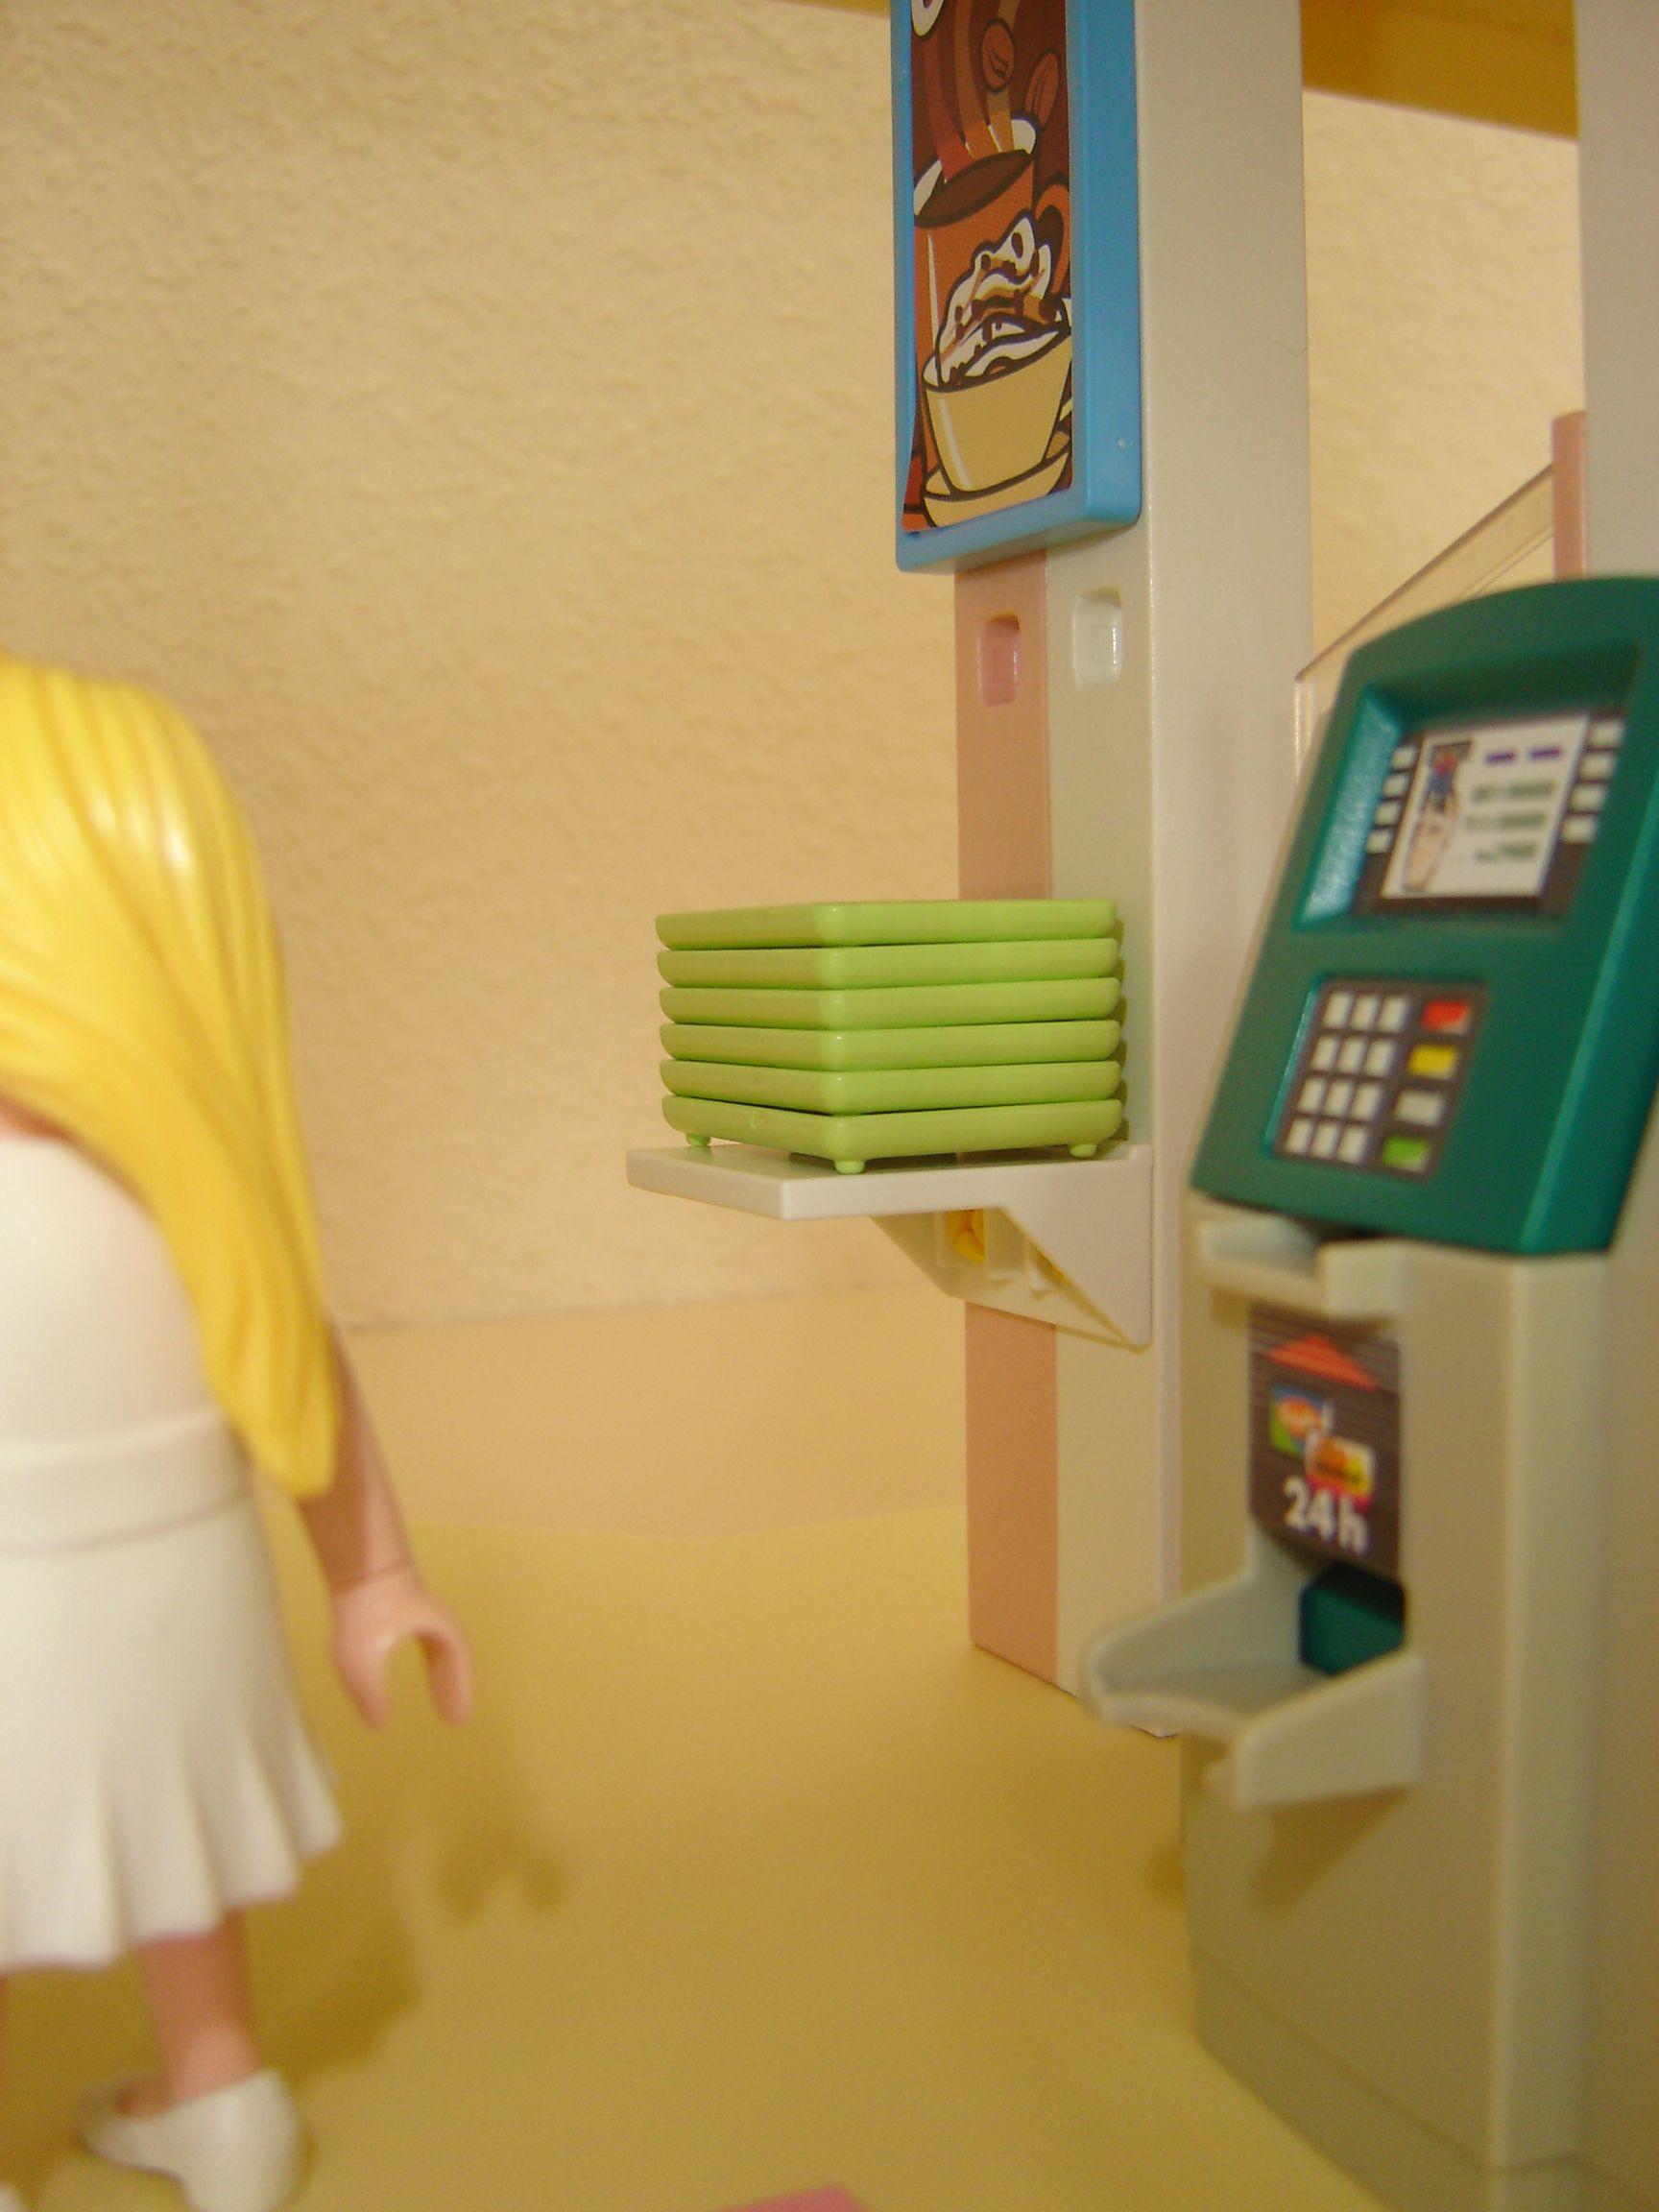 Cash Machine in Lobby